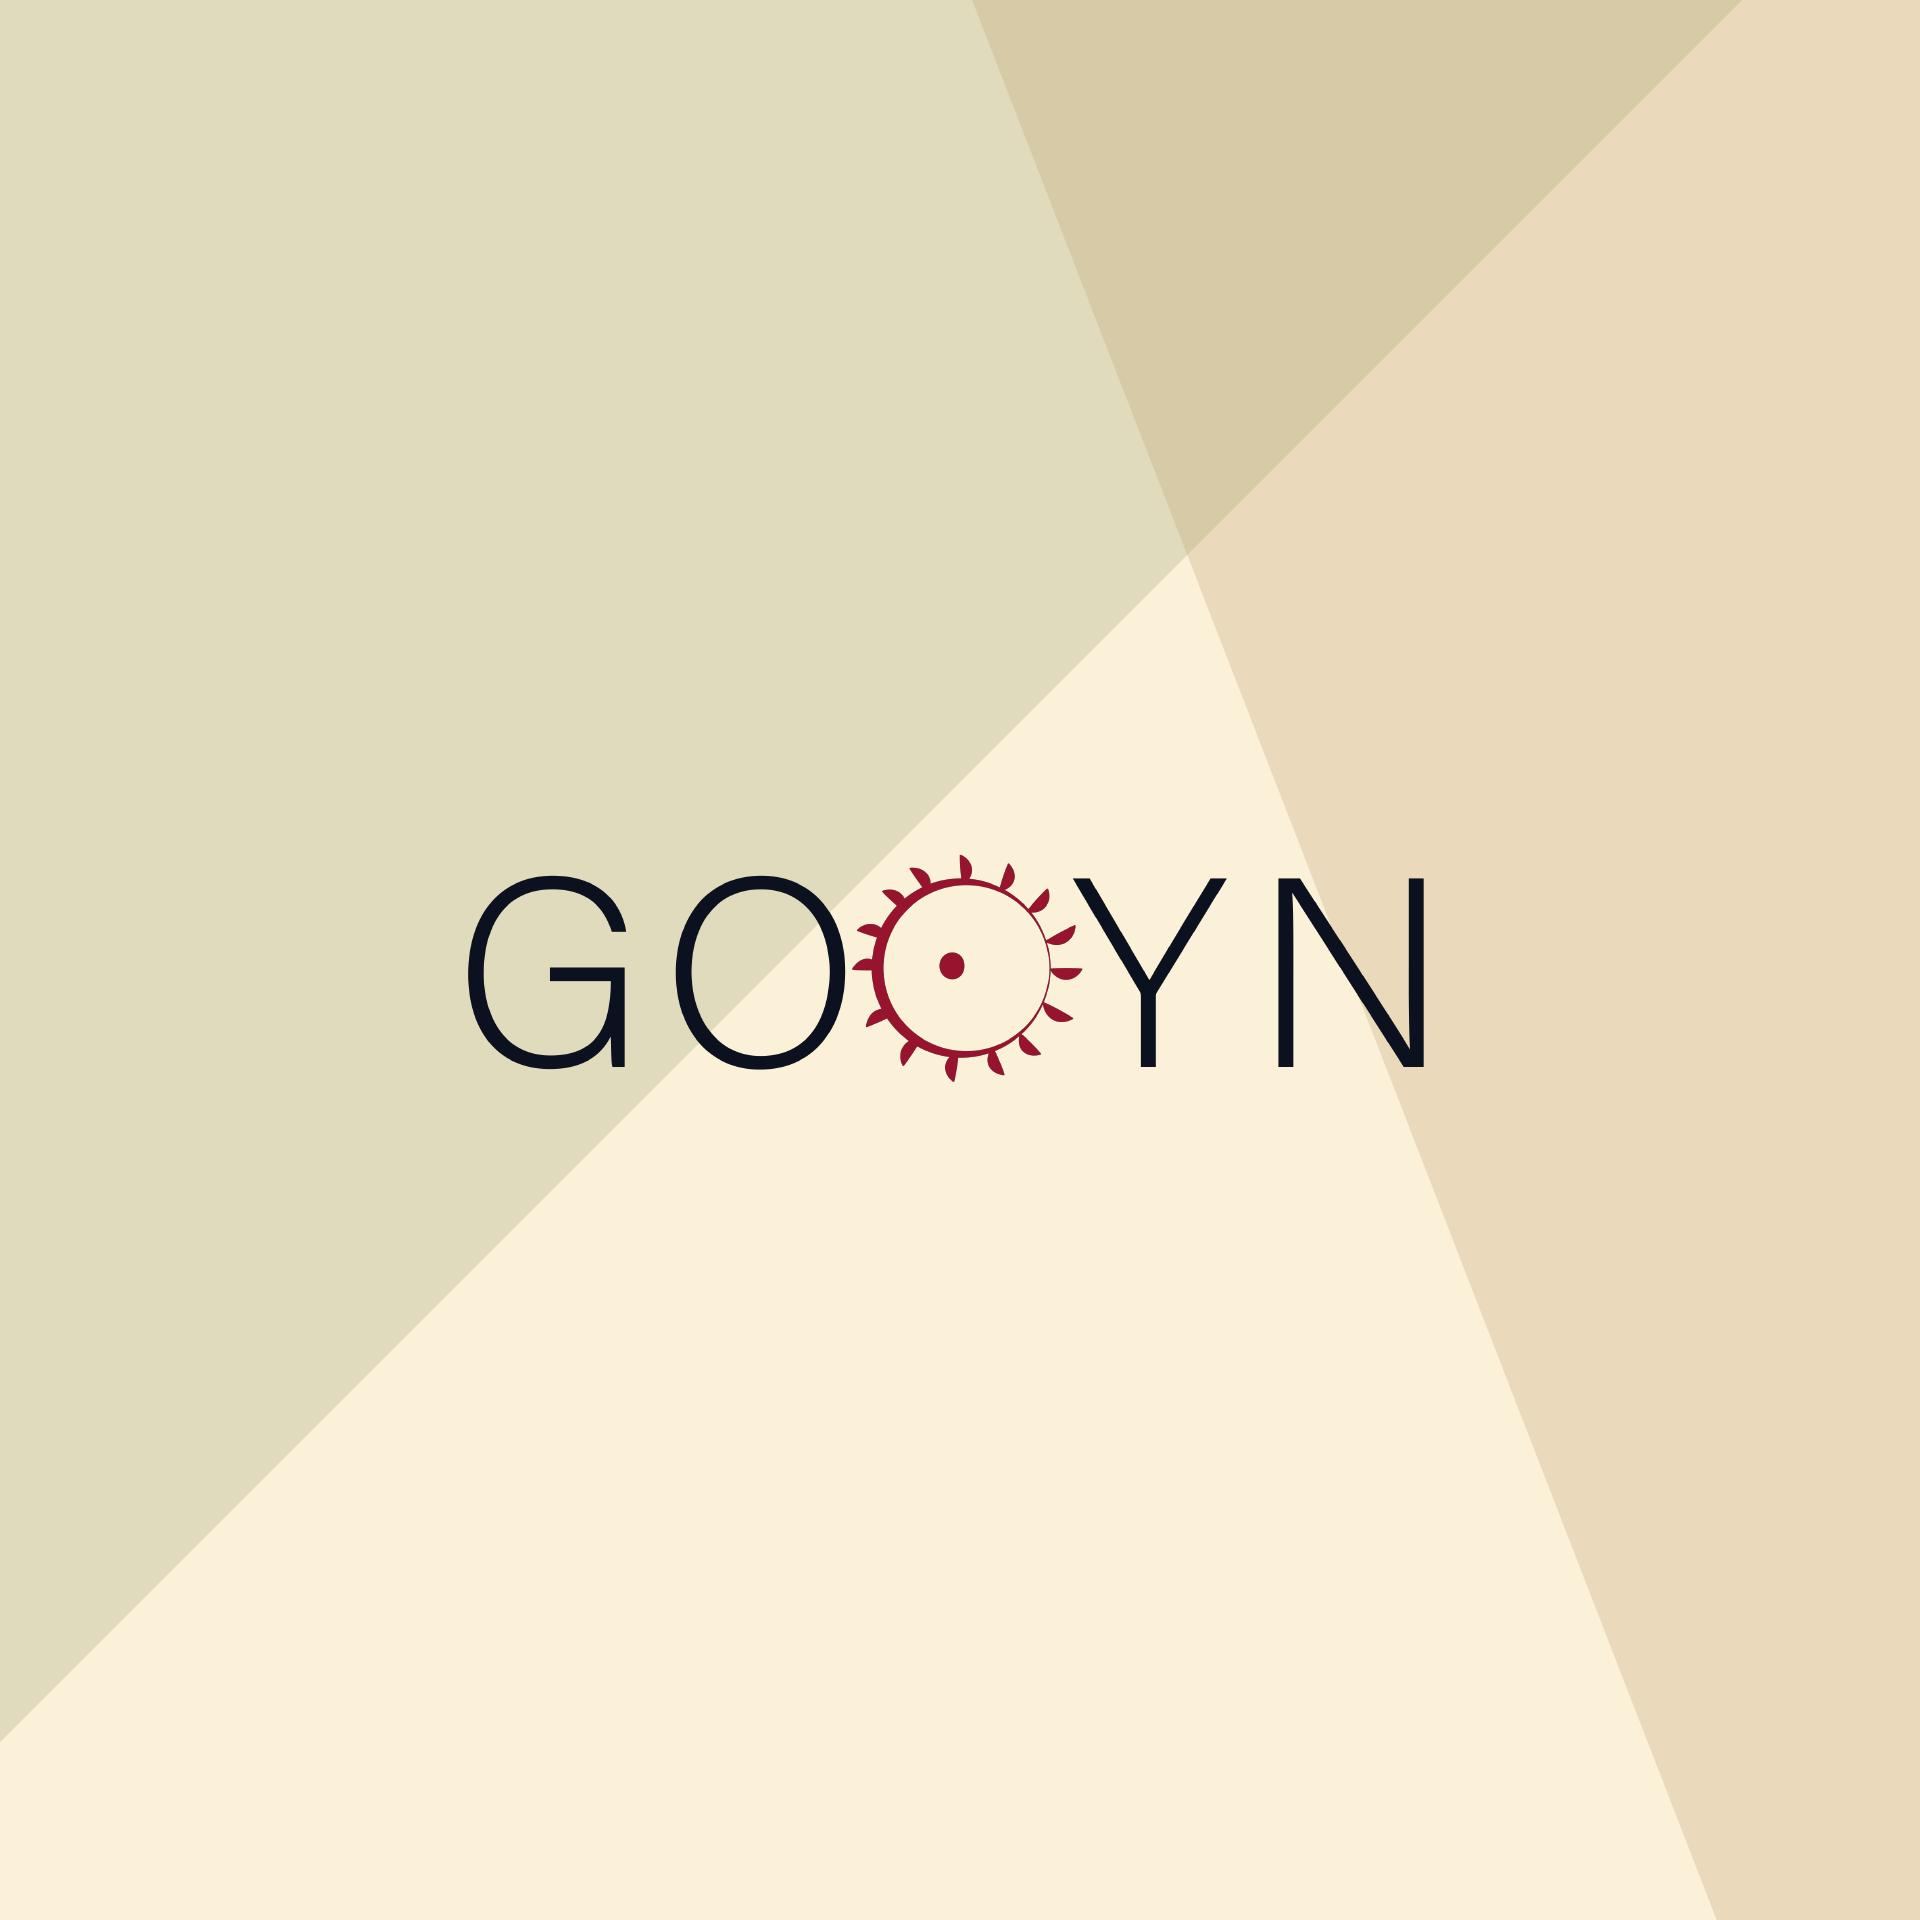 Gooyn